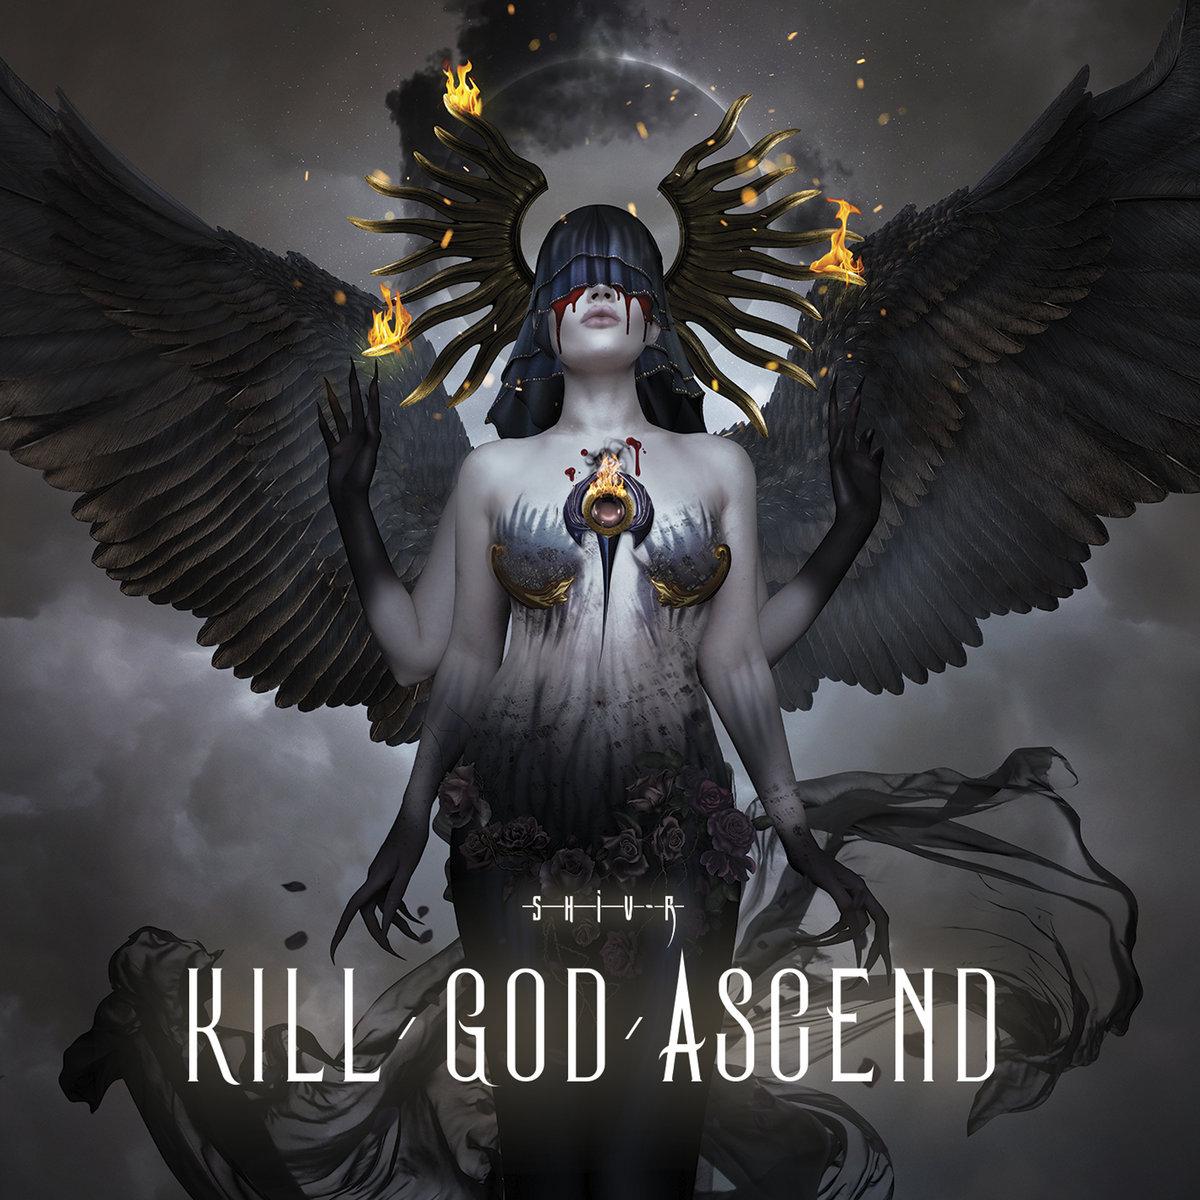 Shiv-R - Kill God Ascend - Shiv-R - Kill God Ascend